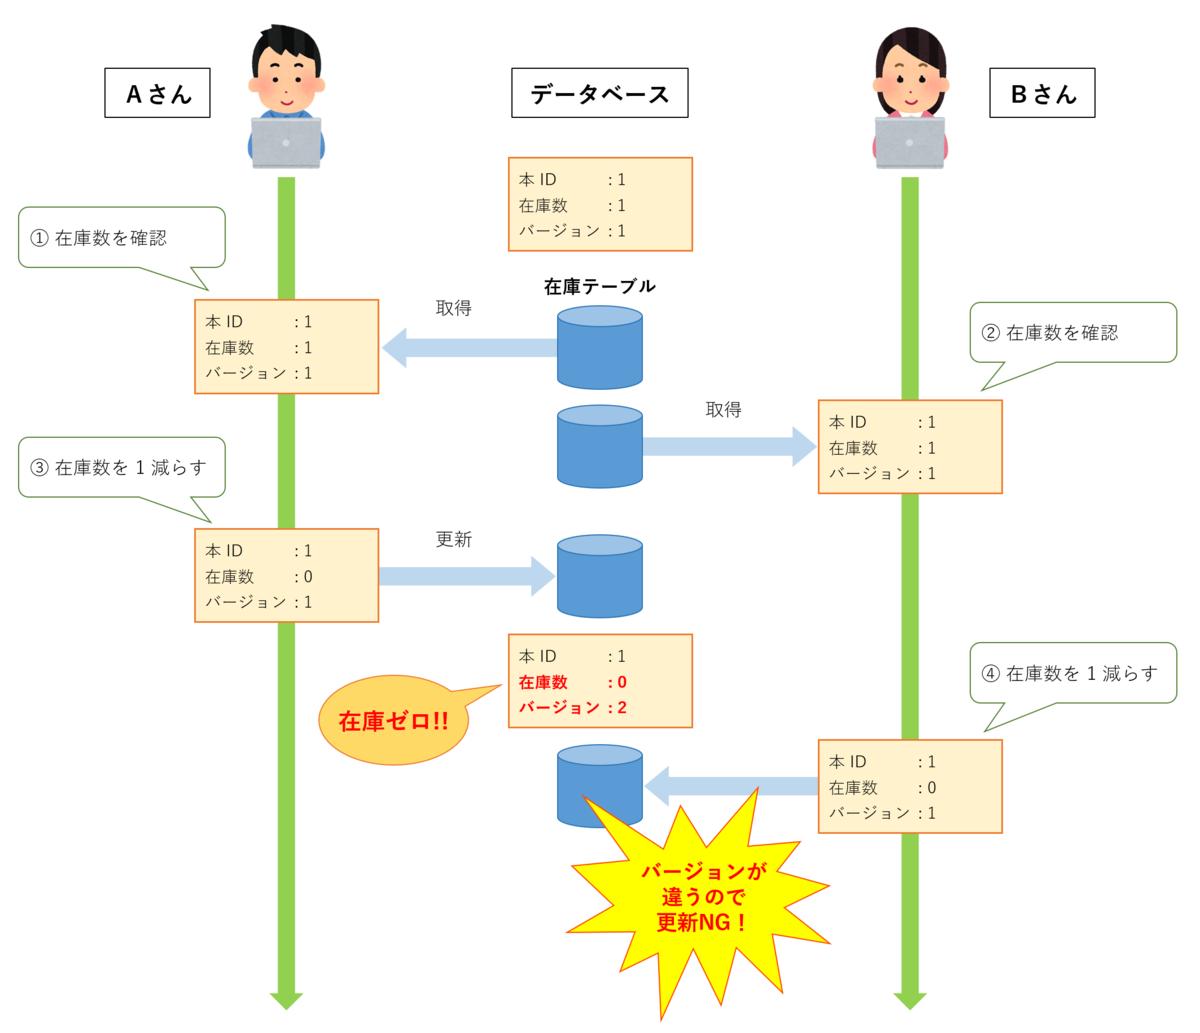 f:id:akiyoko:20201127234543p:plain